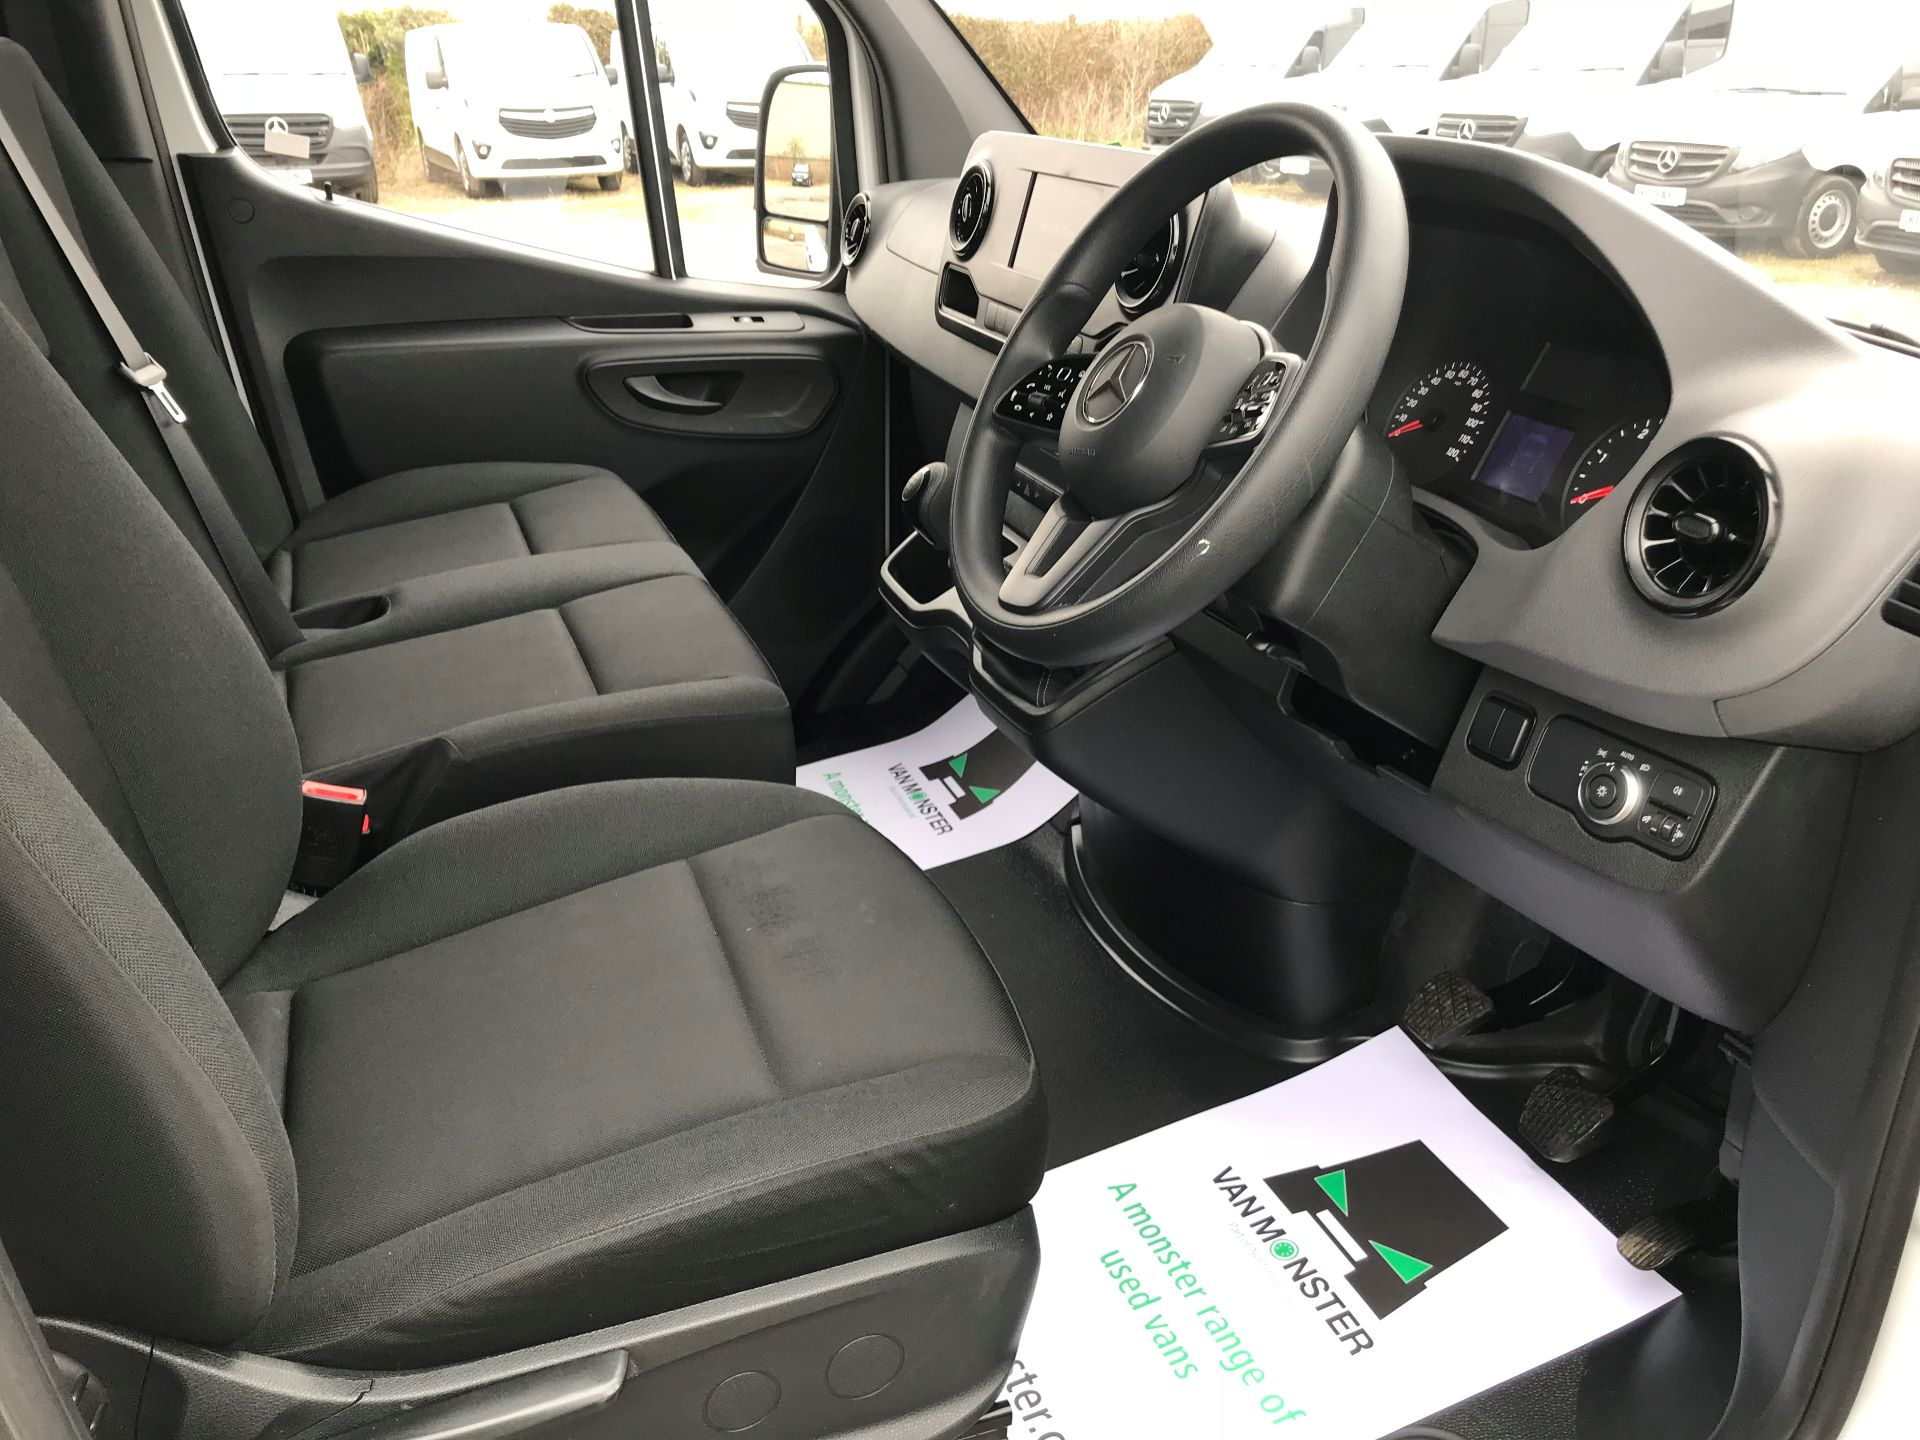 2019 Mercedes-Benz Sprinter 3.5T L2 H2 FWD Van (KM19TML) Image 22